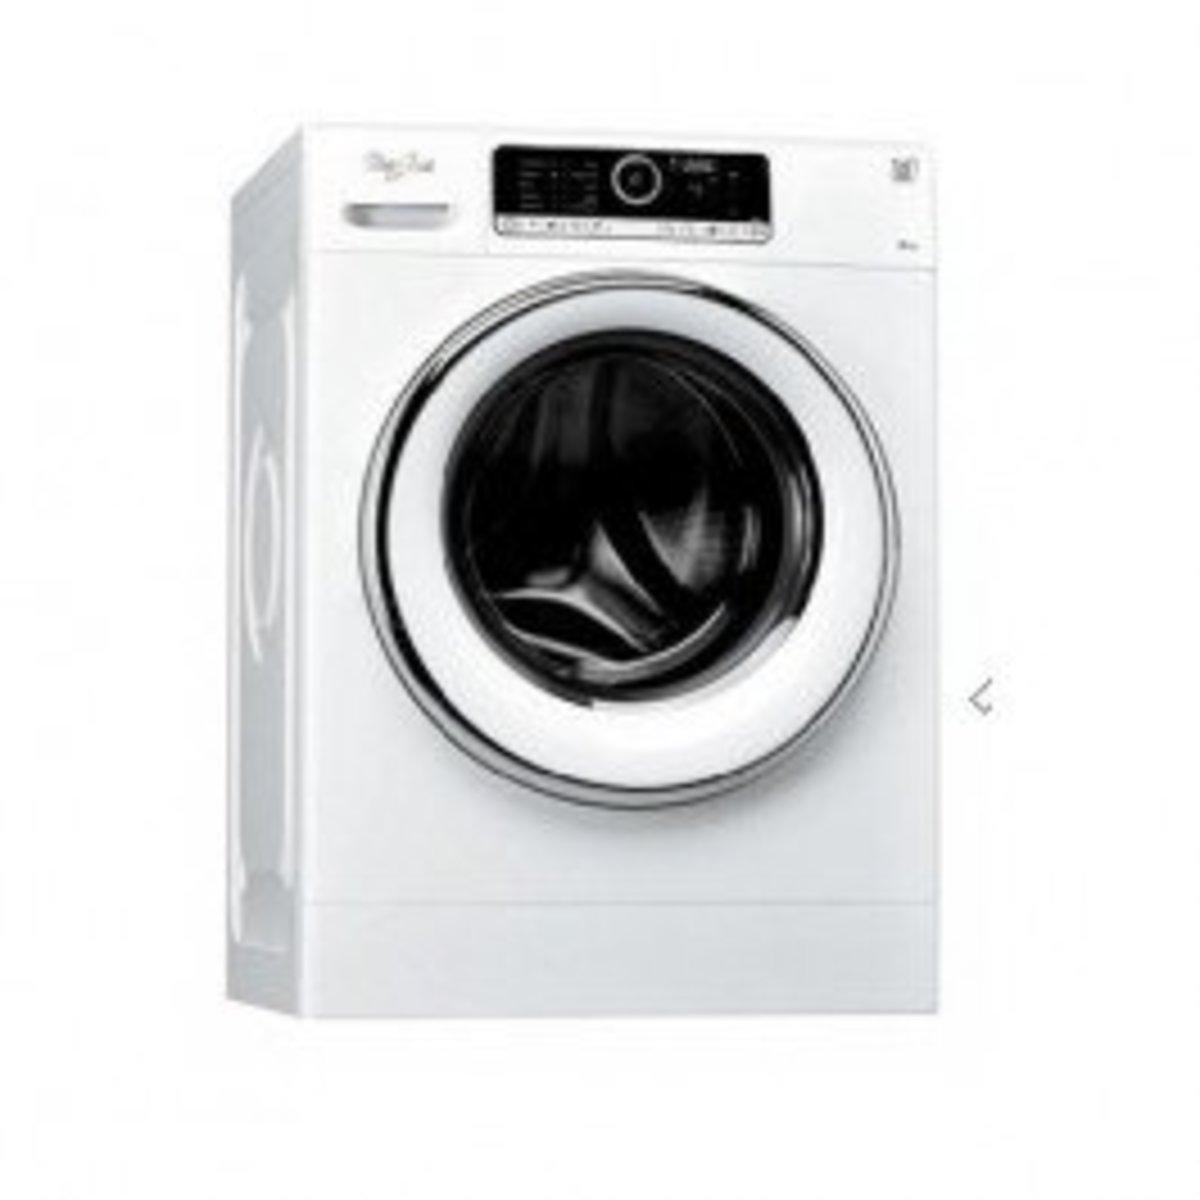 FSCR80220 第6感 前置式洗衣機 (8公斤1200轉)